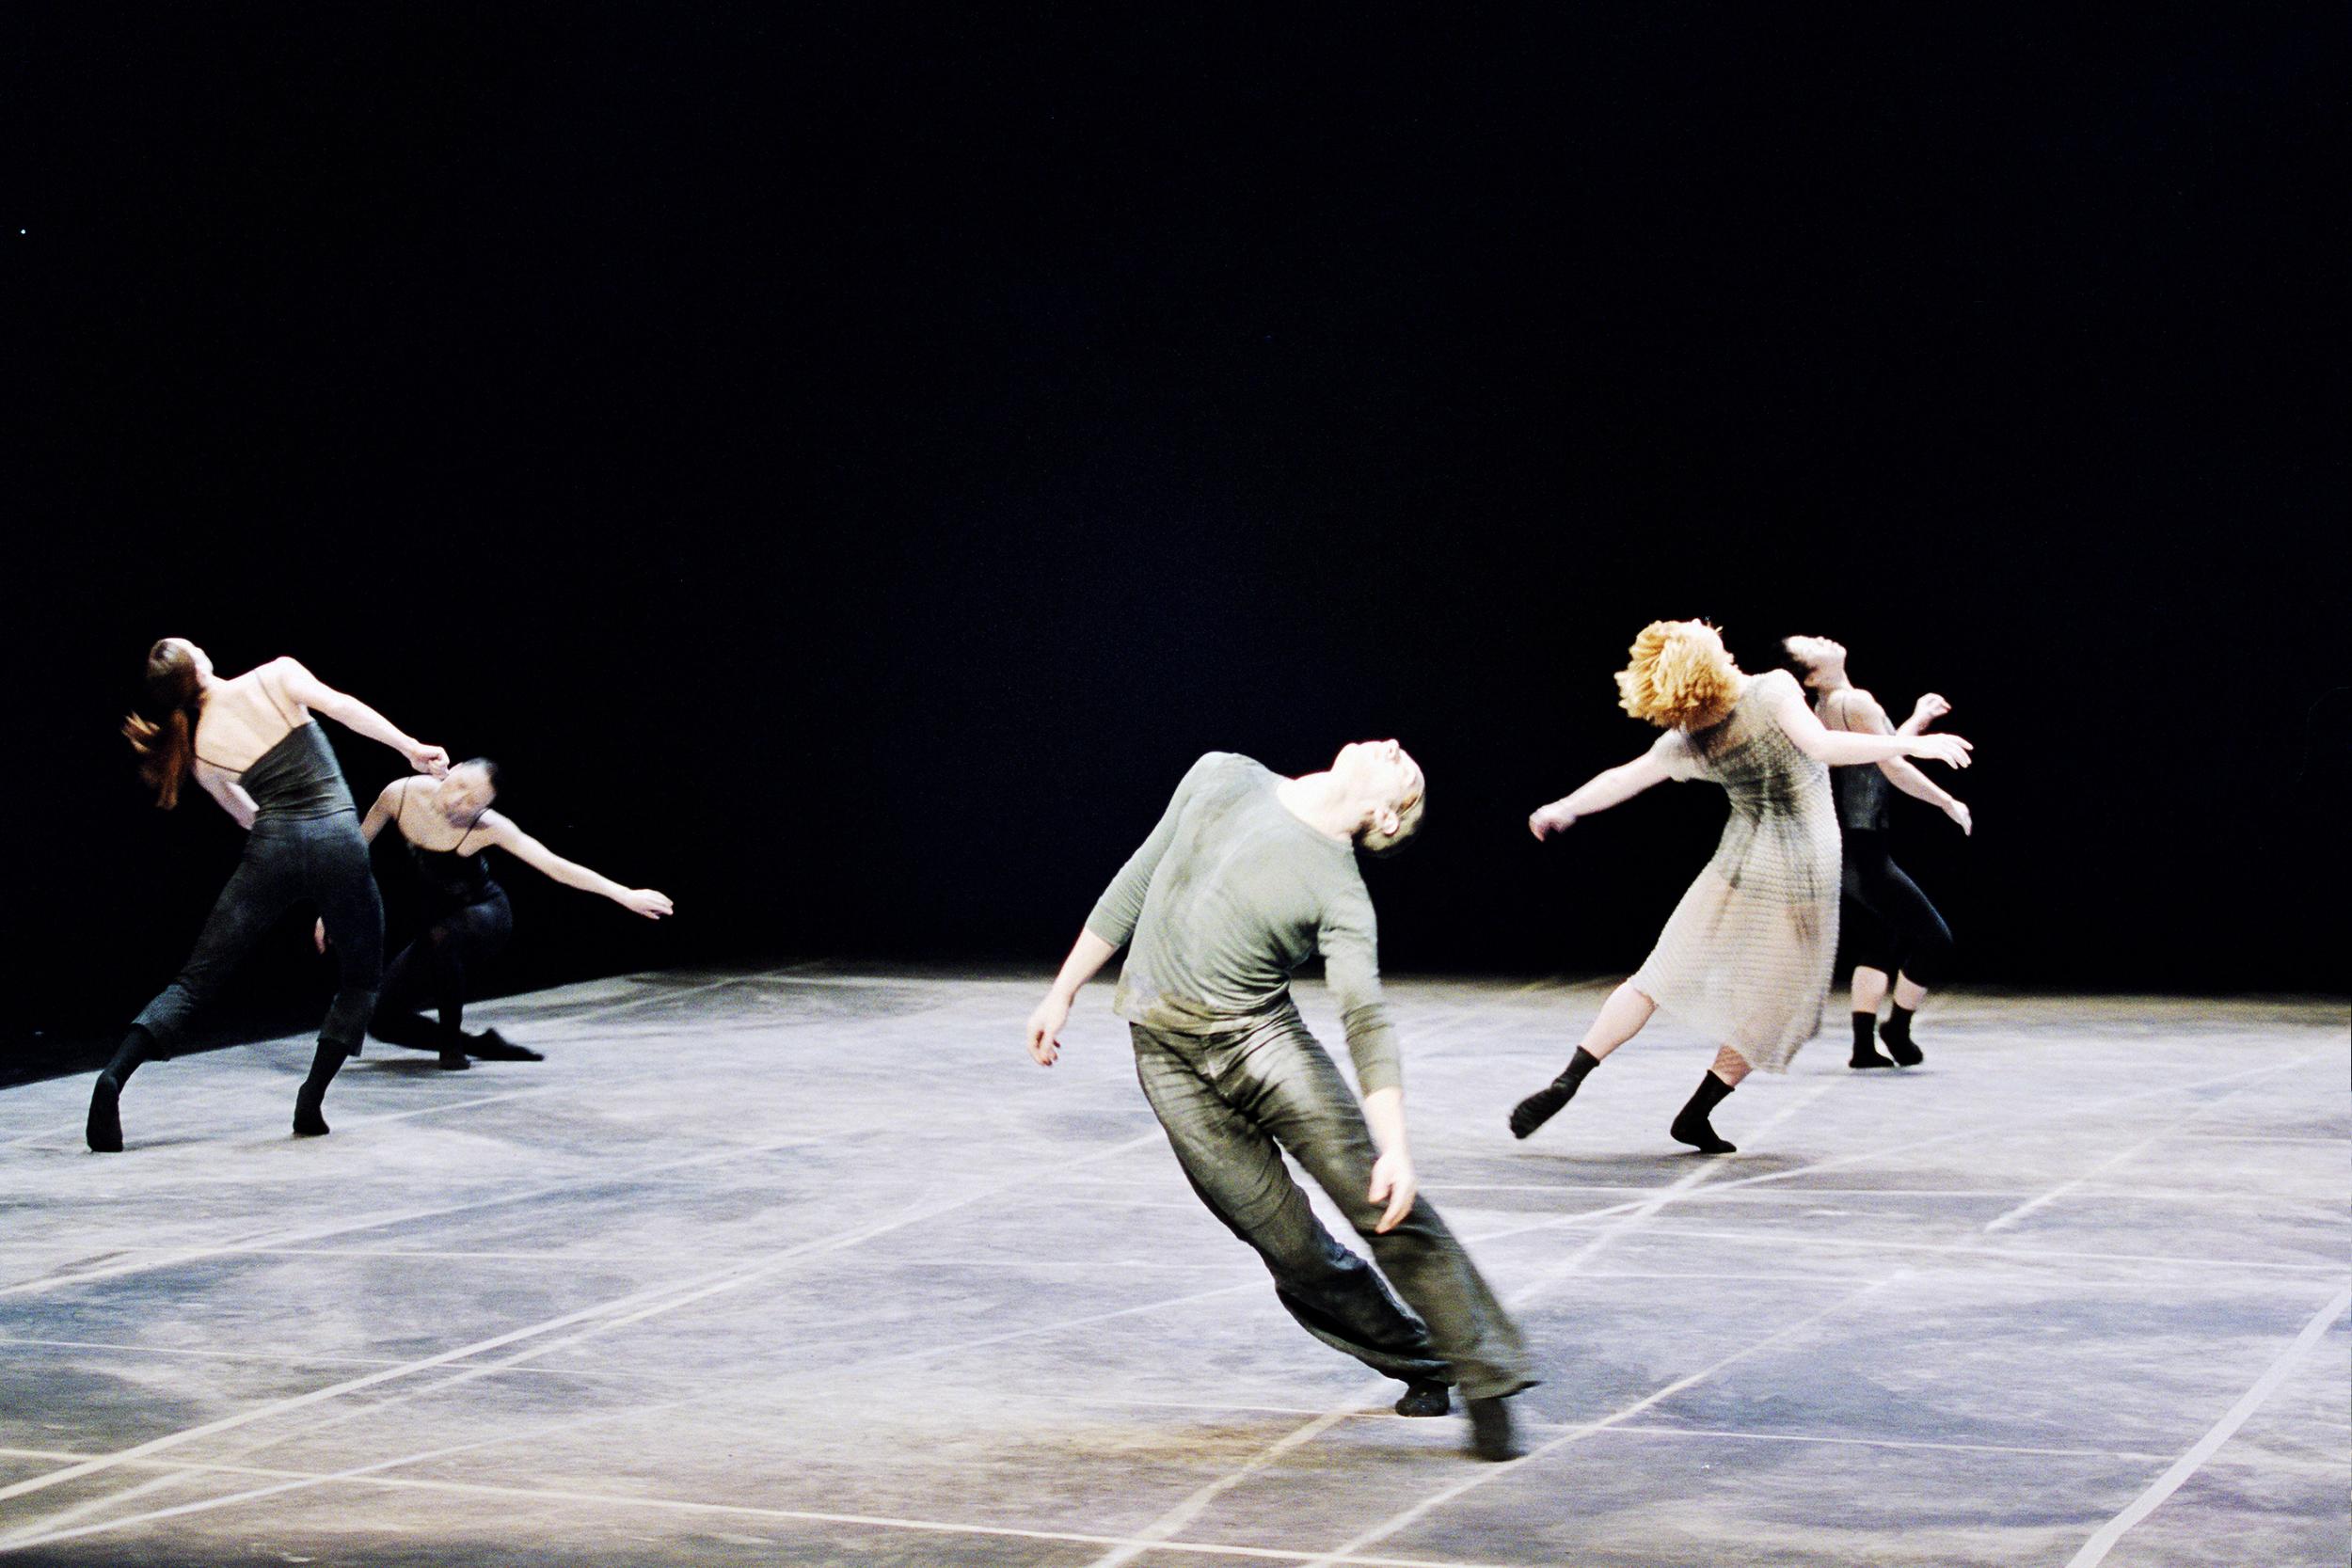 Rite of Spring (2003)